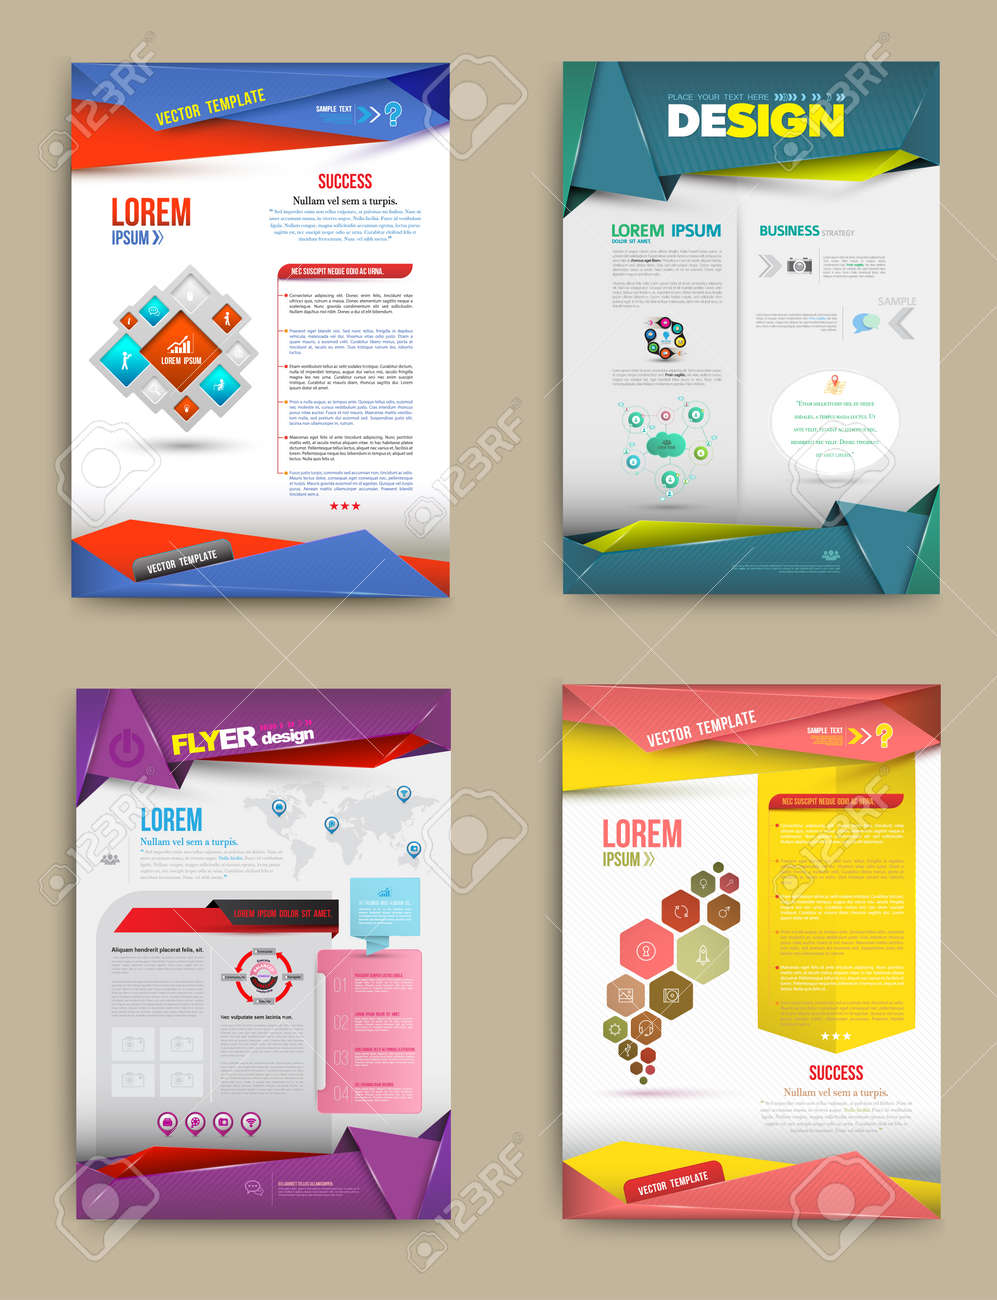 Set of Flyer, Brochure Design Templates. Abstract Modern Backgrounds. business concept. Vector illustration. - 37091361